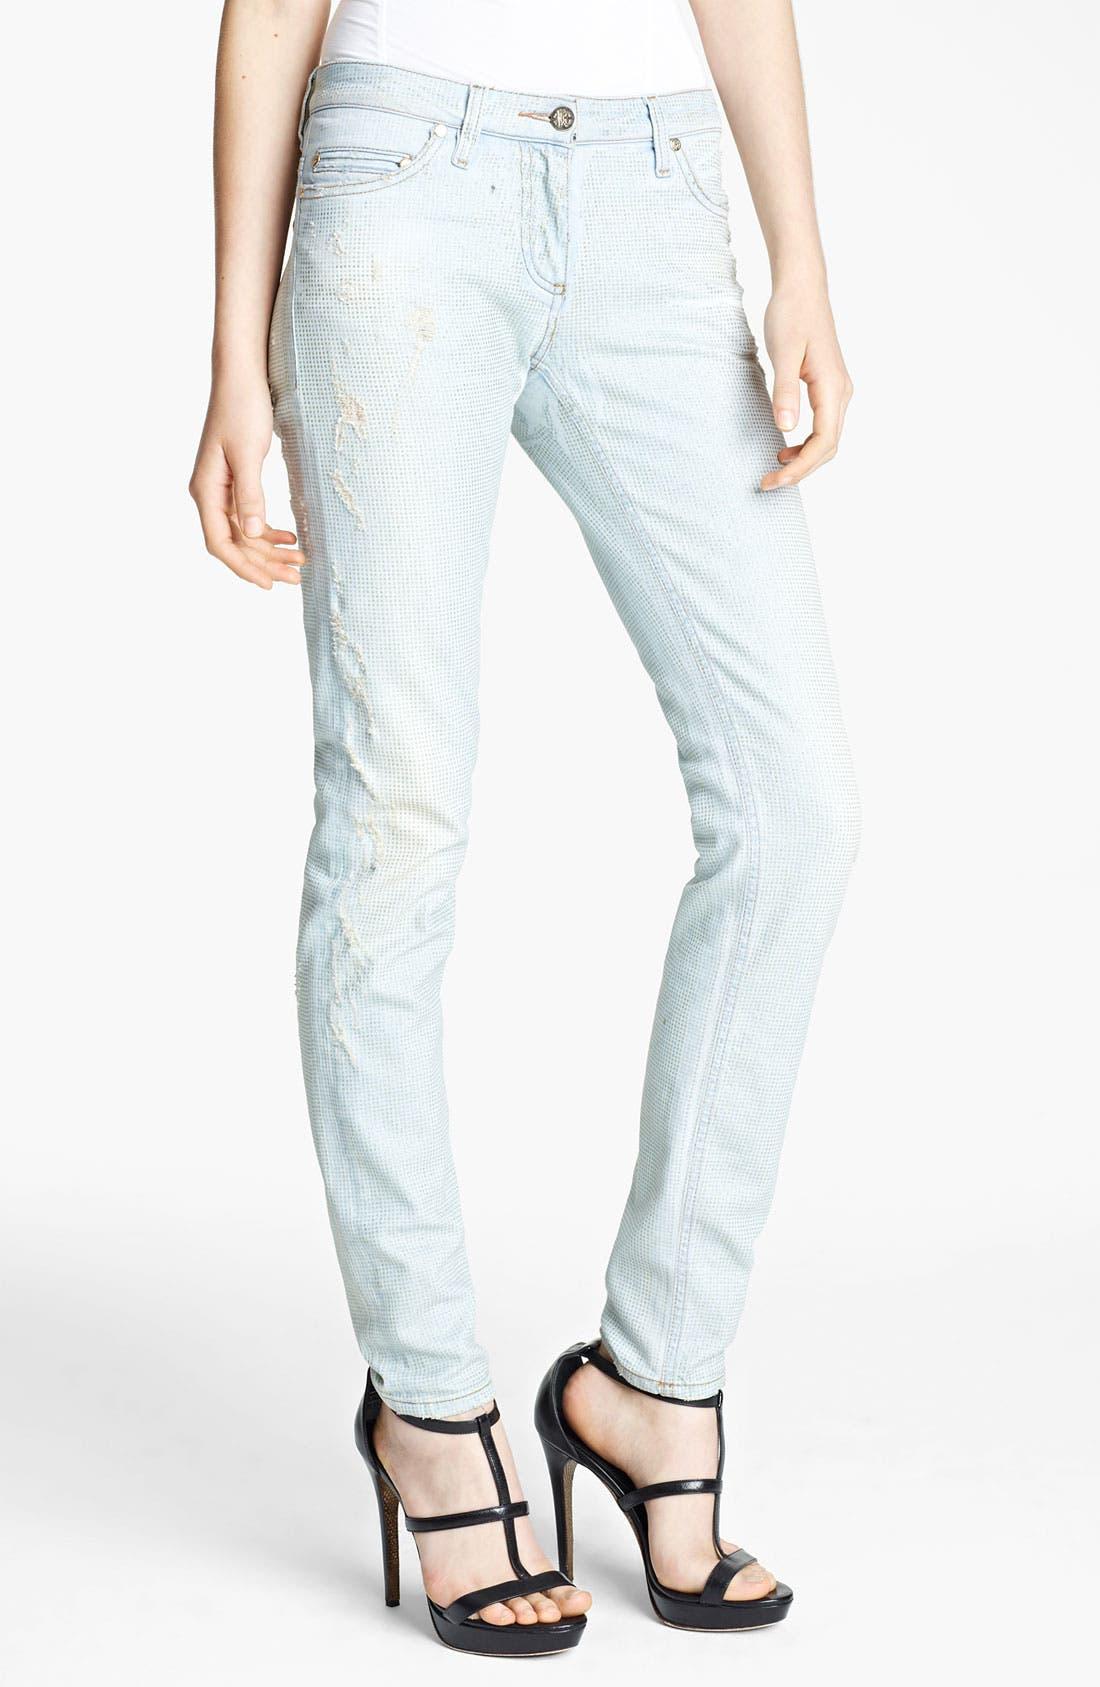 Alternate Image 1 Selected - Roberto Cavalli Crystal Encrusted Skinny Jeans